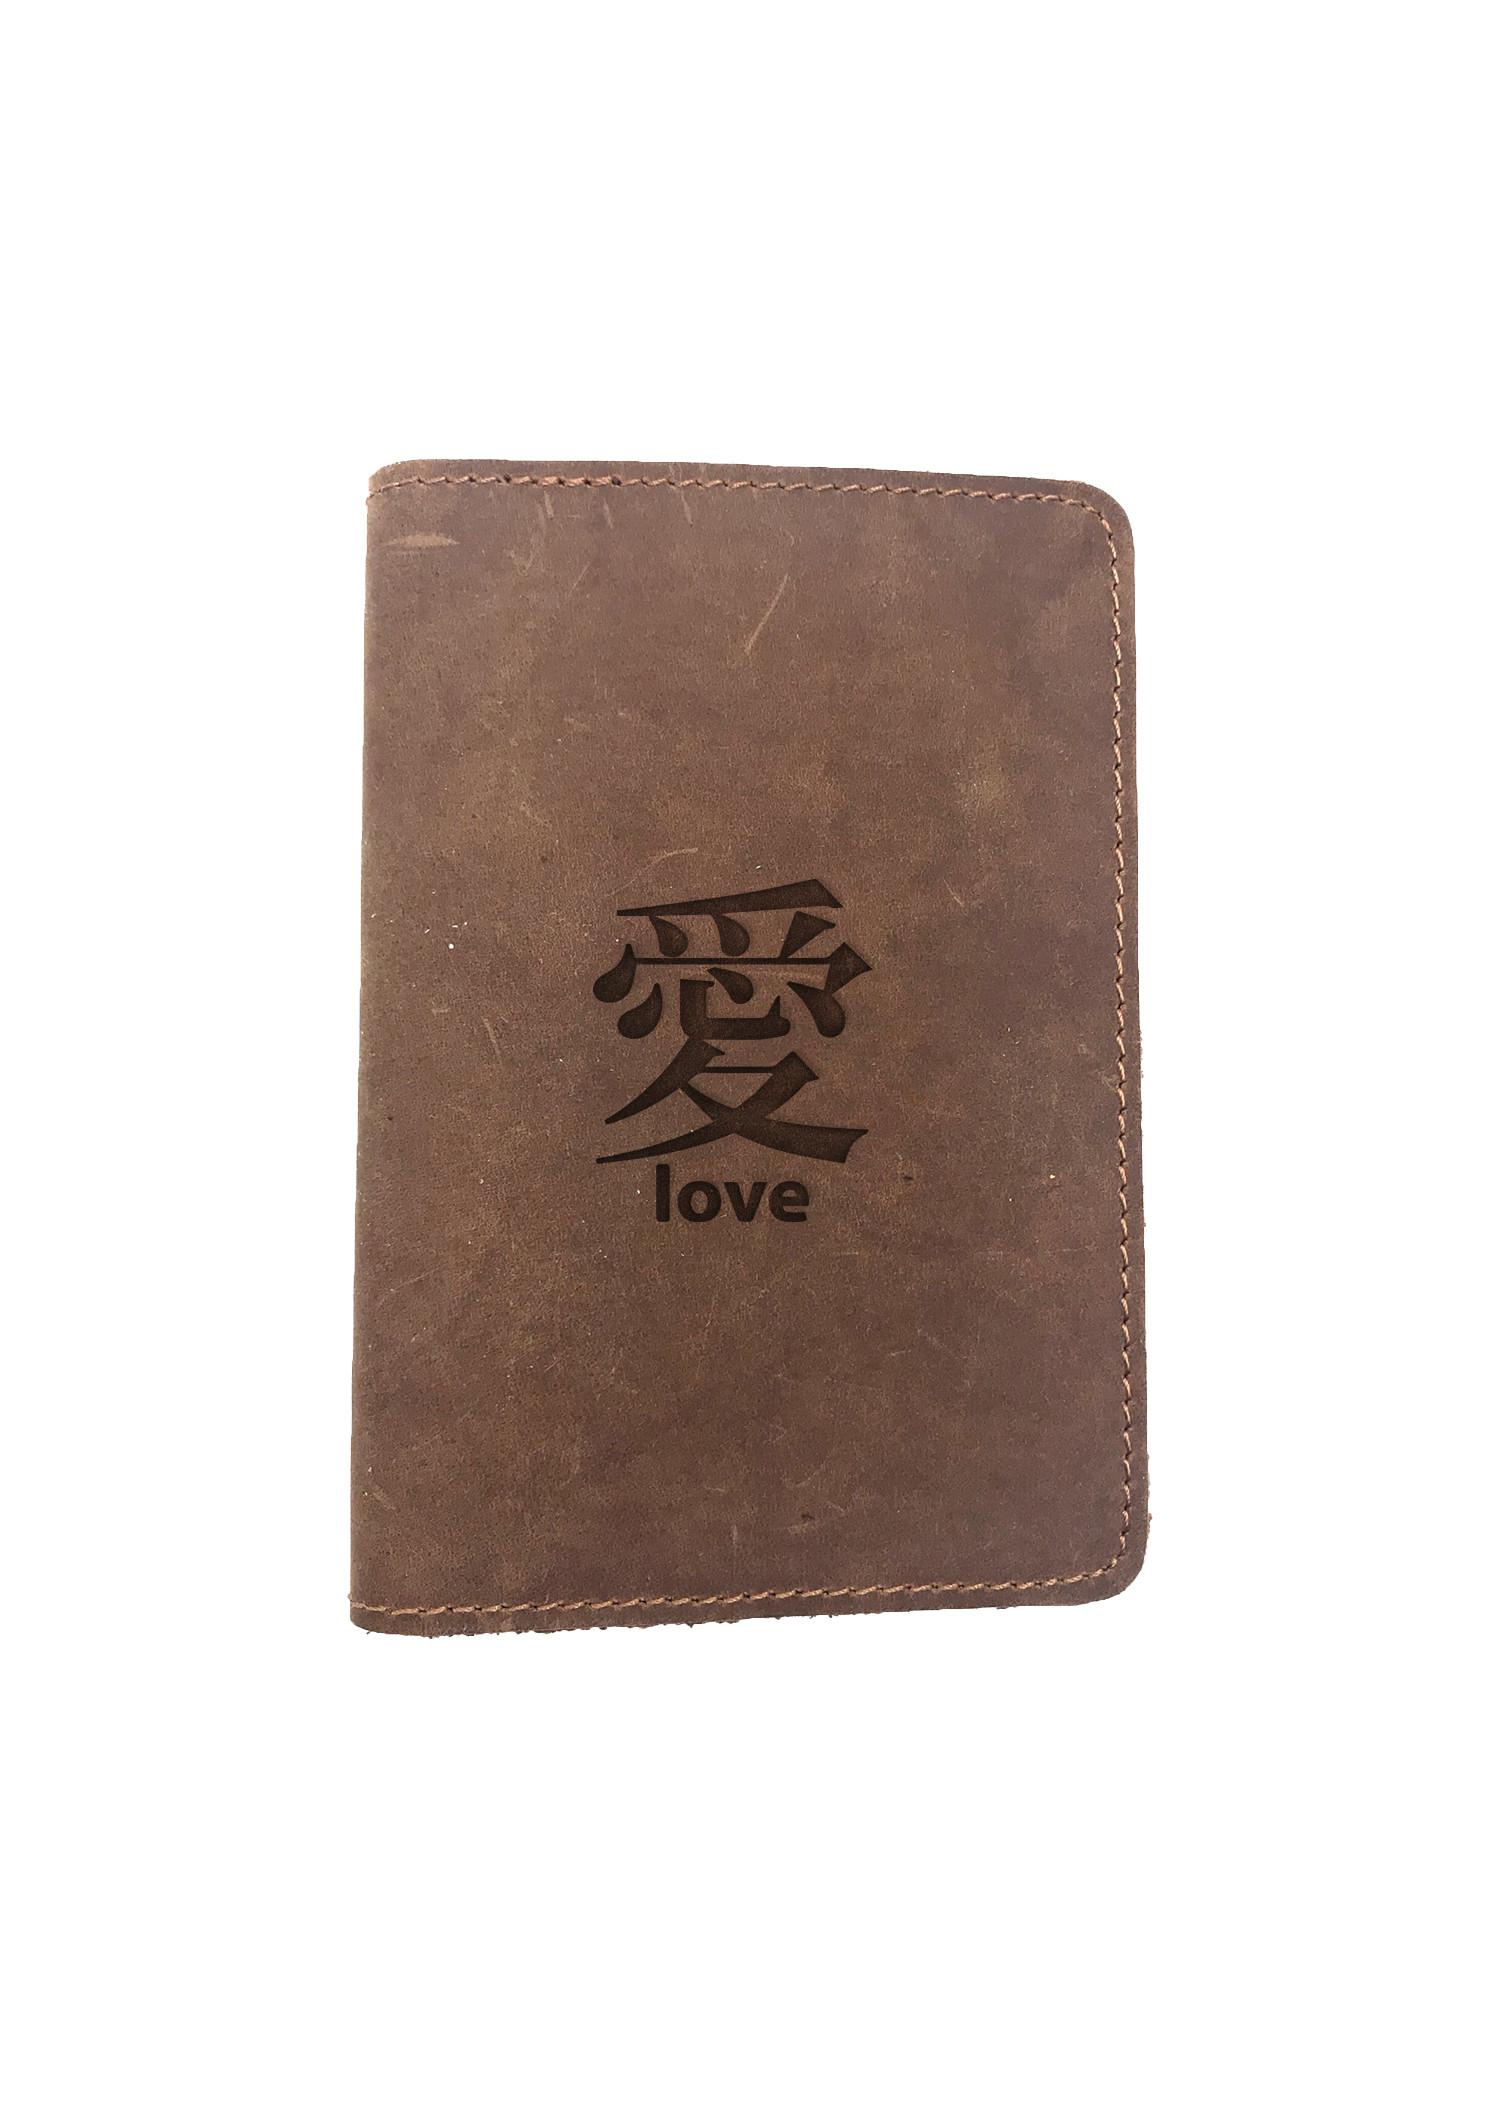 Passport Cover Bao Da Hộ Chiếu Da Sáp Khắc Hình Chữ LOVE STENCIL ART (BROWN)